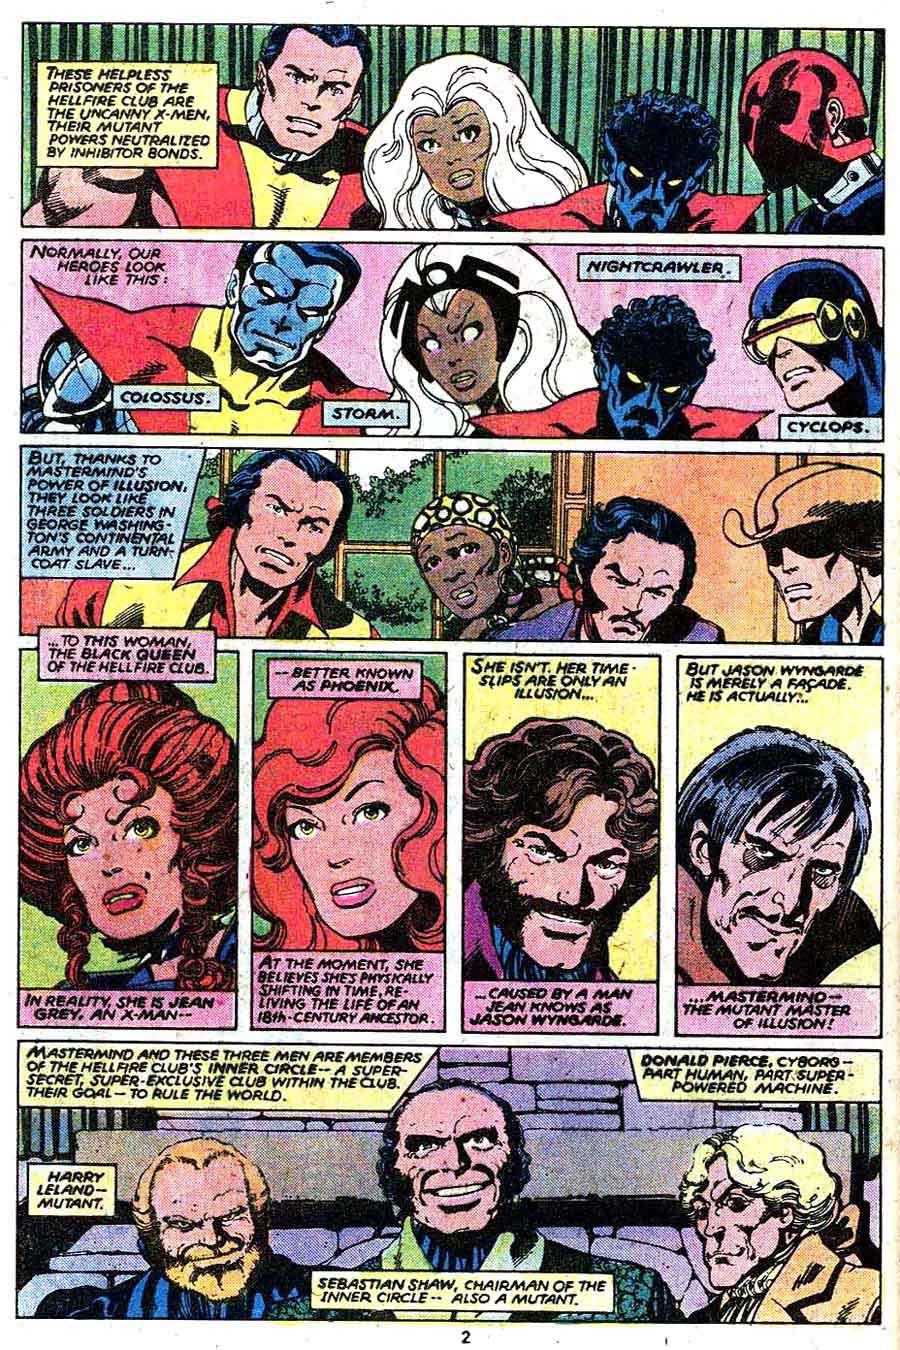 X-men v1 #134 marvel comic book page art by John Byrne